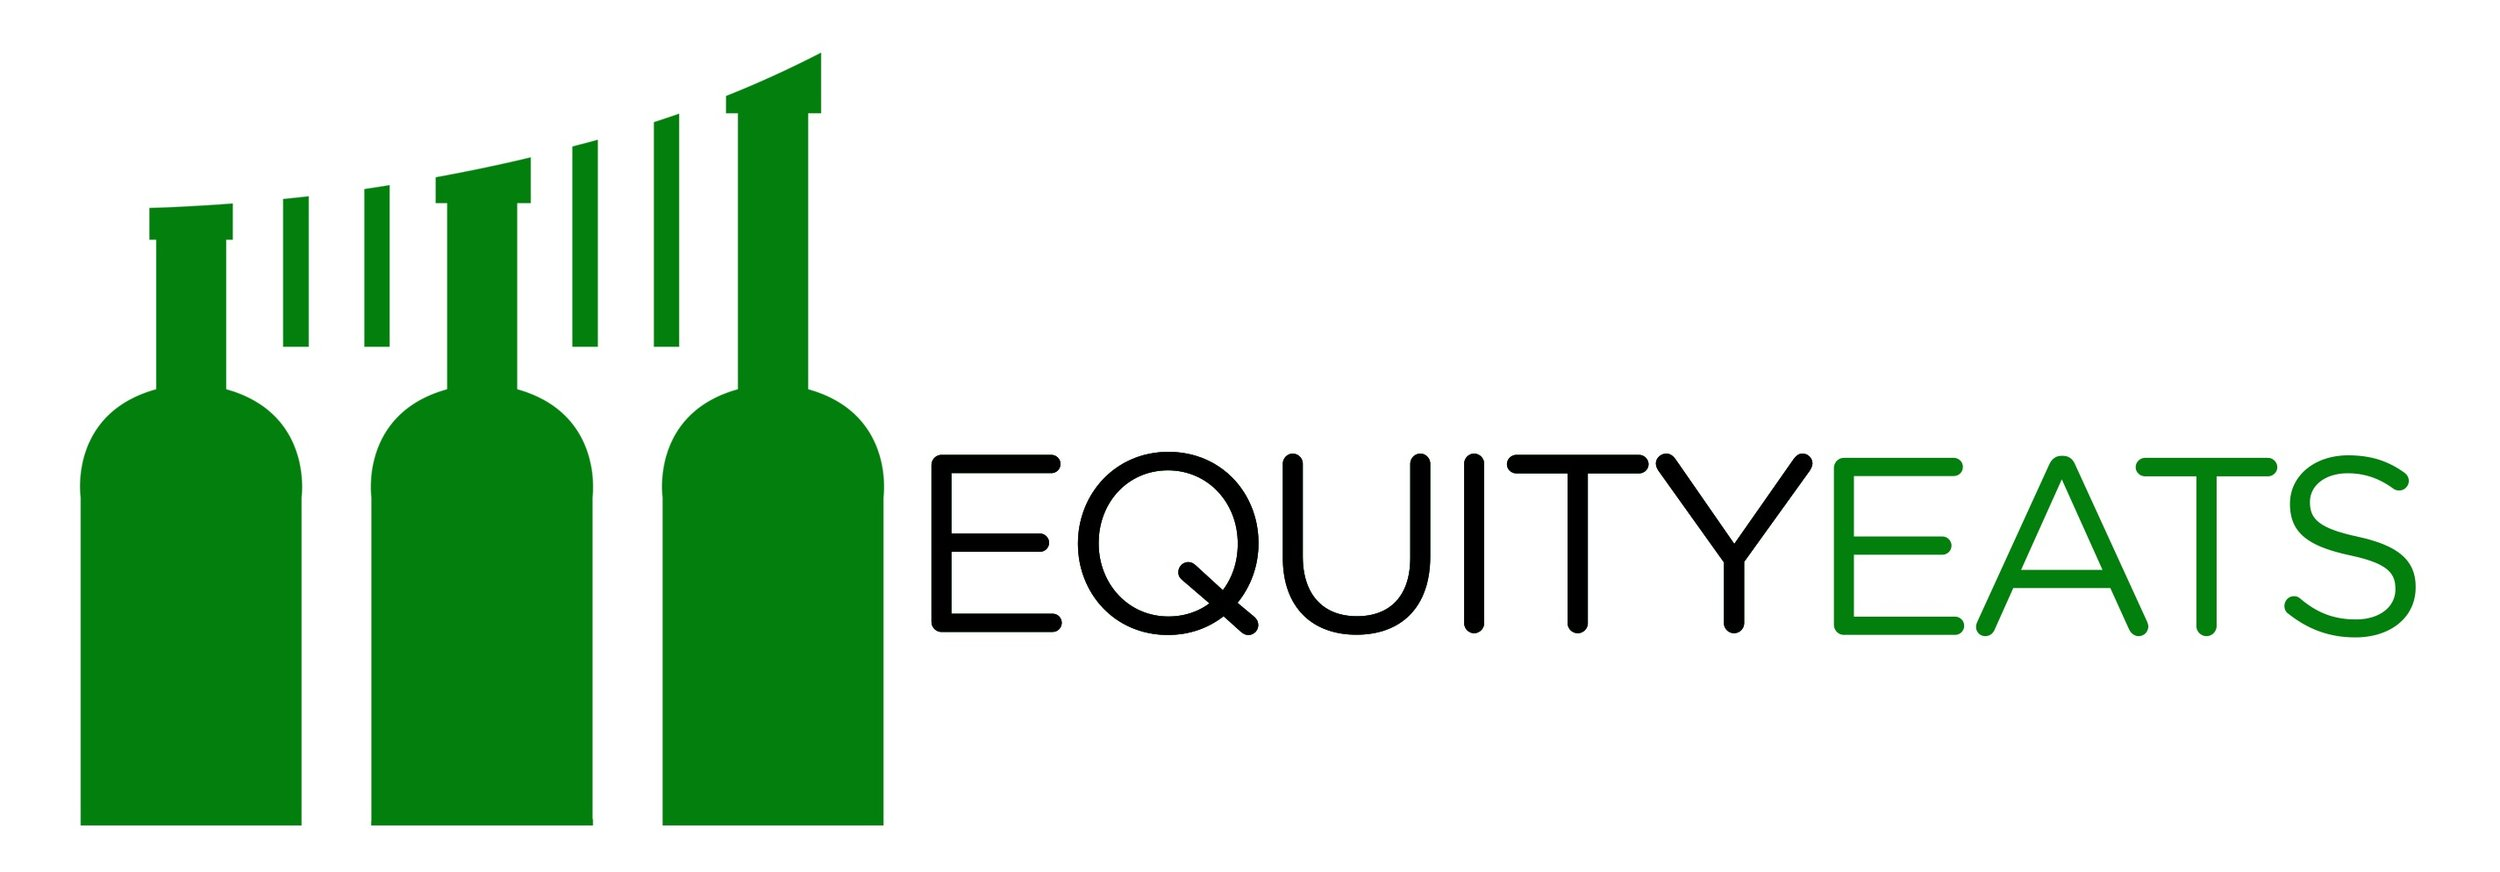 EquityEats Logo.jpg